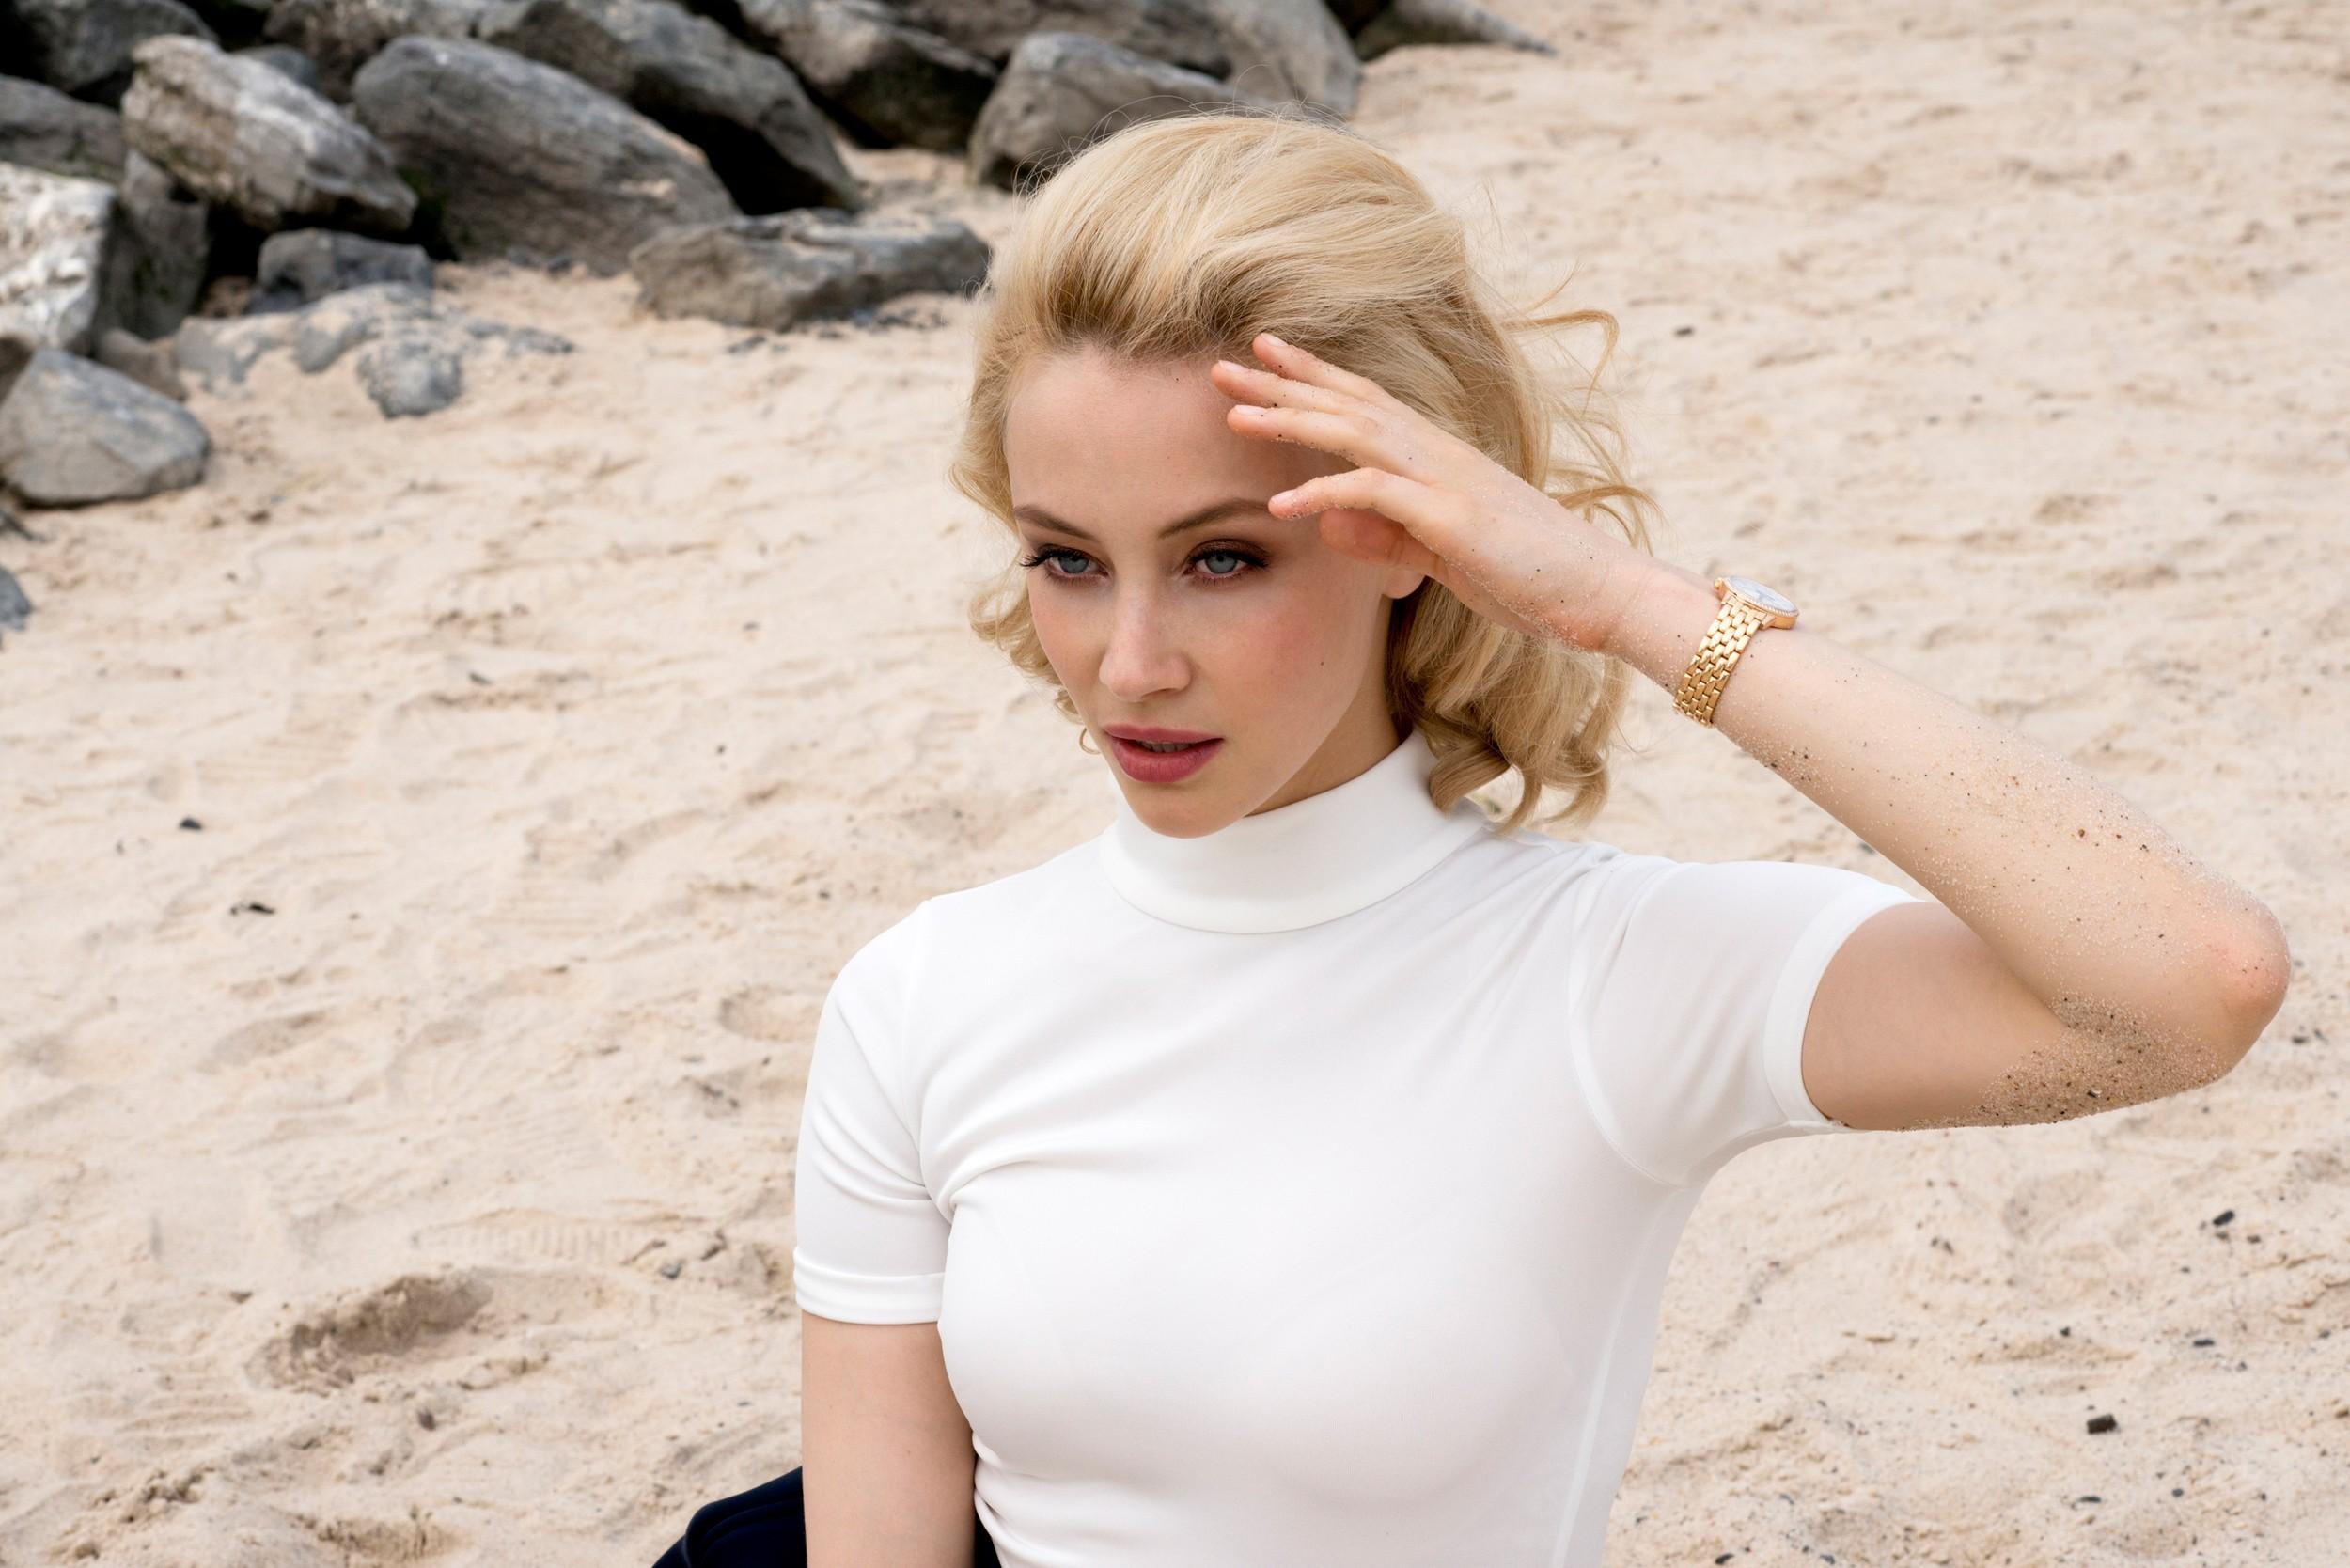 Wallpaper White Women Model Blonde Sand Watch Actress Dress